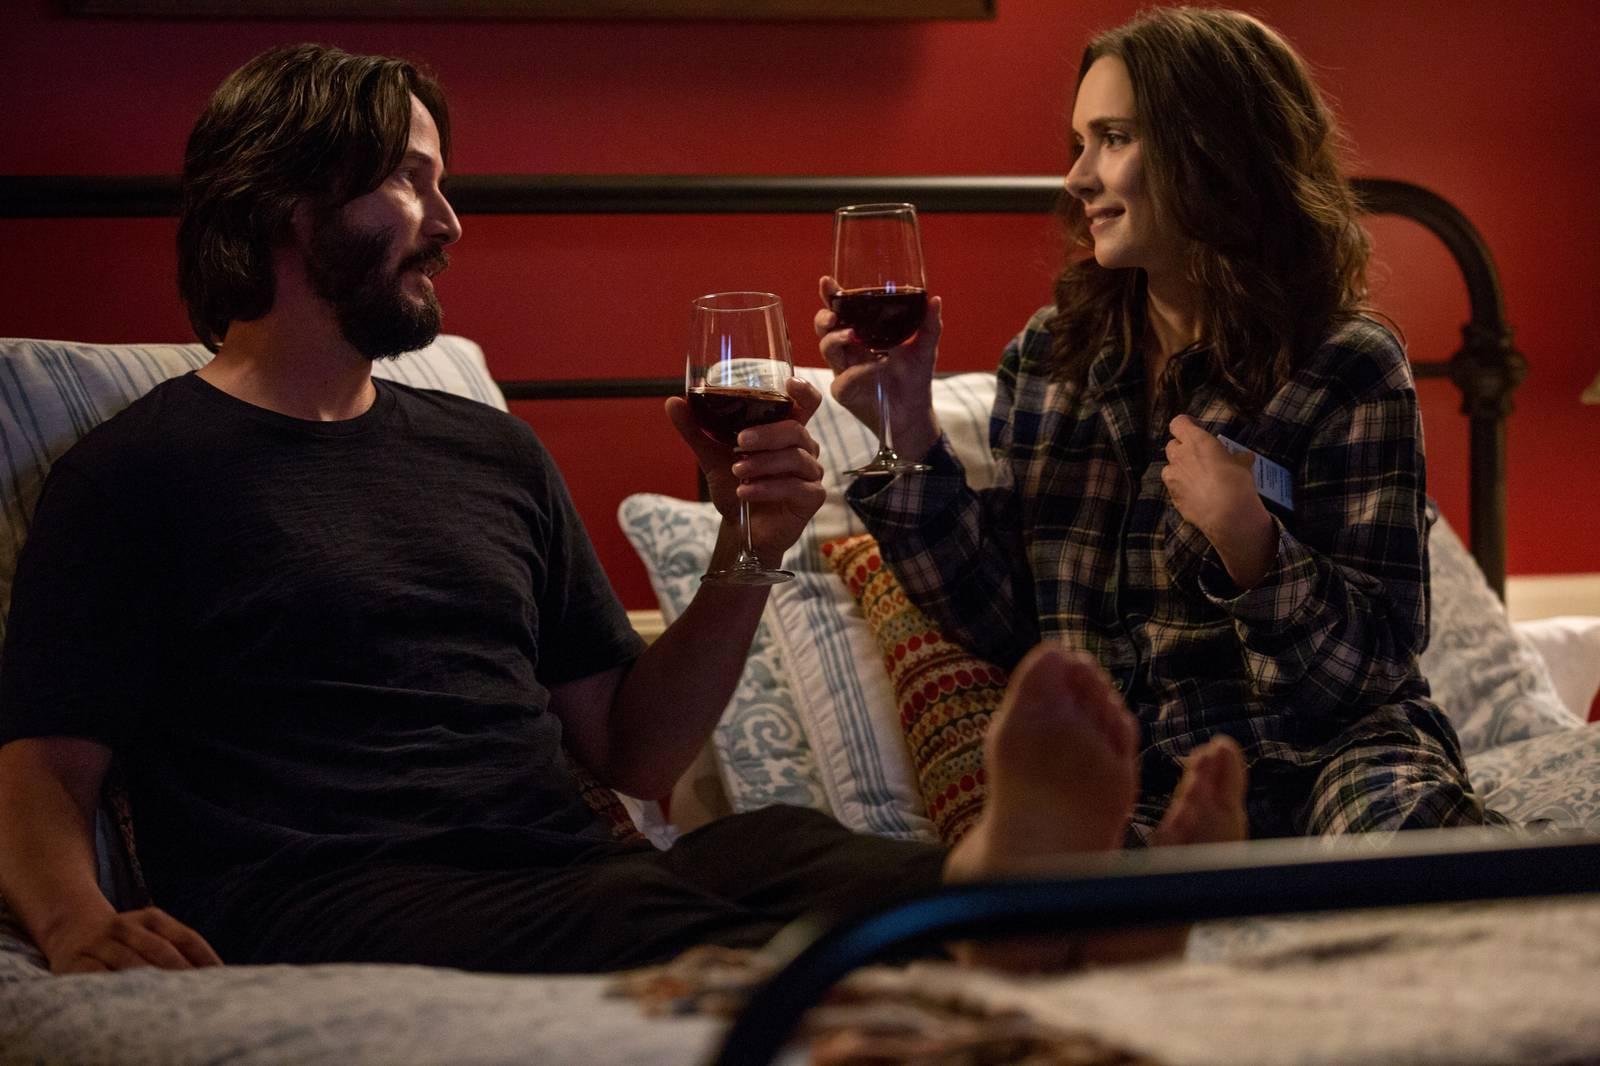 Film Cesta za láskou (2018)